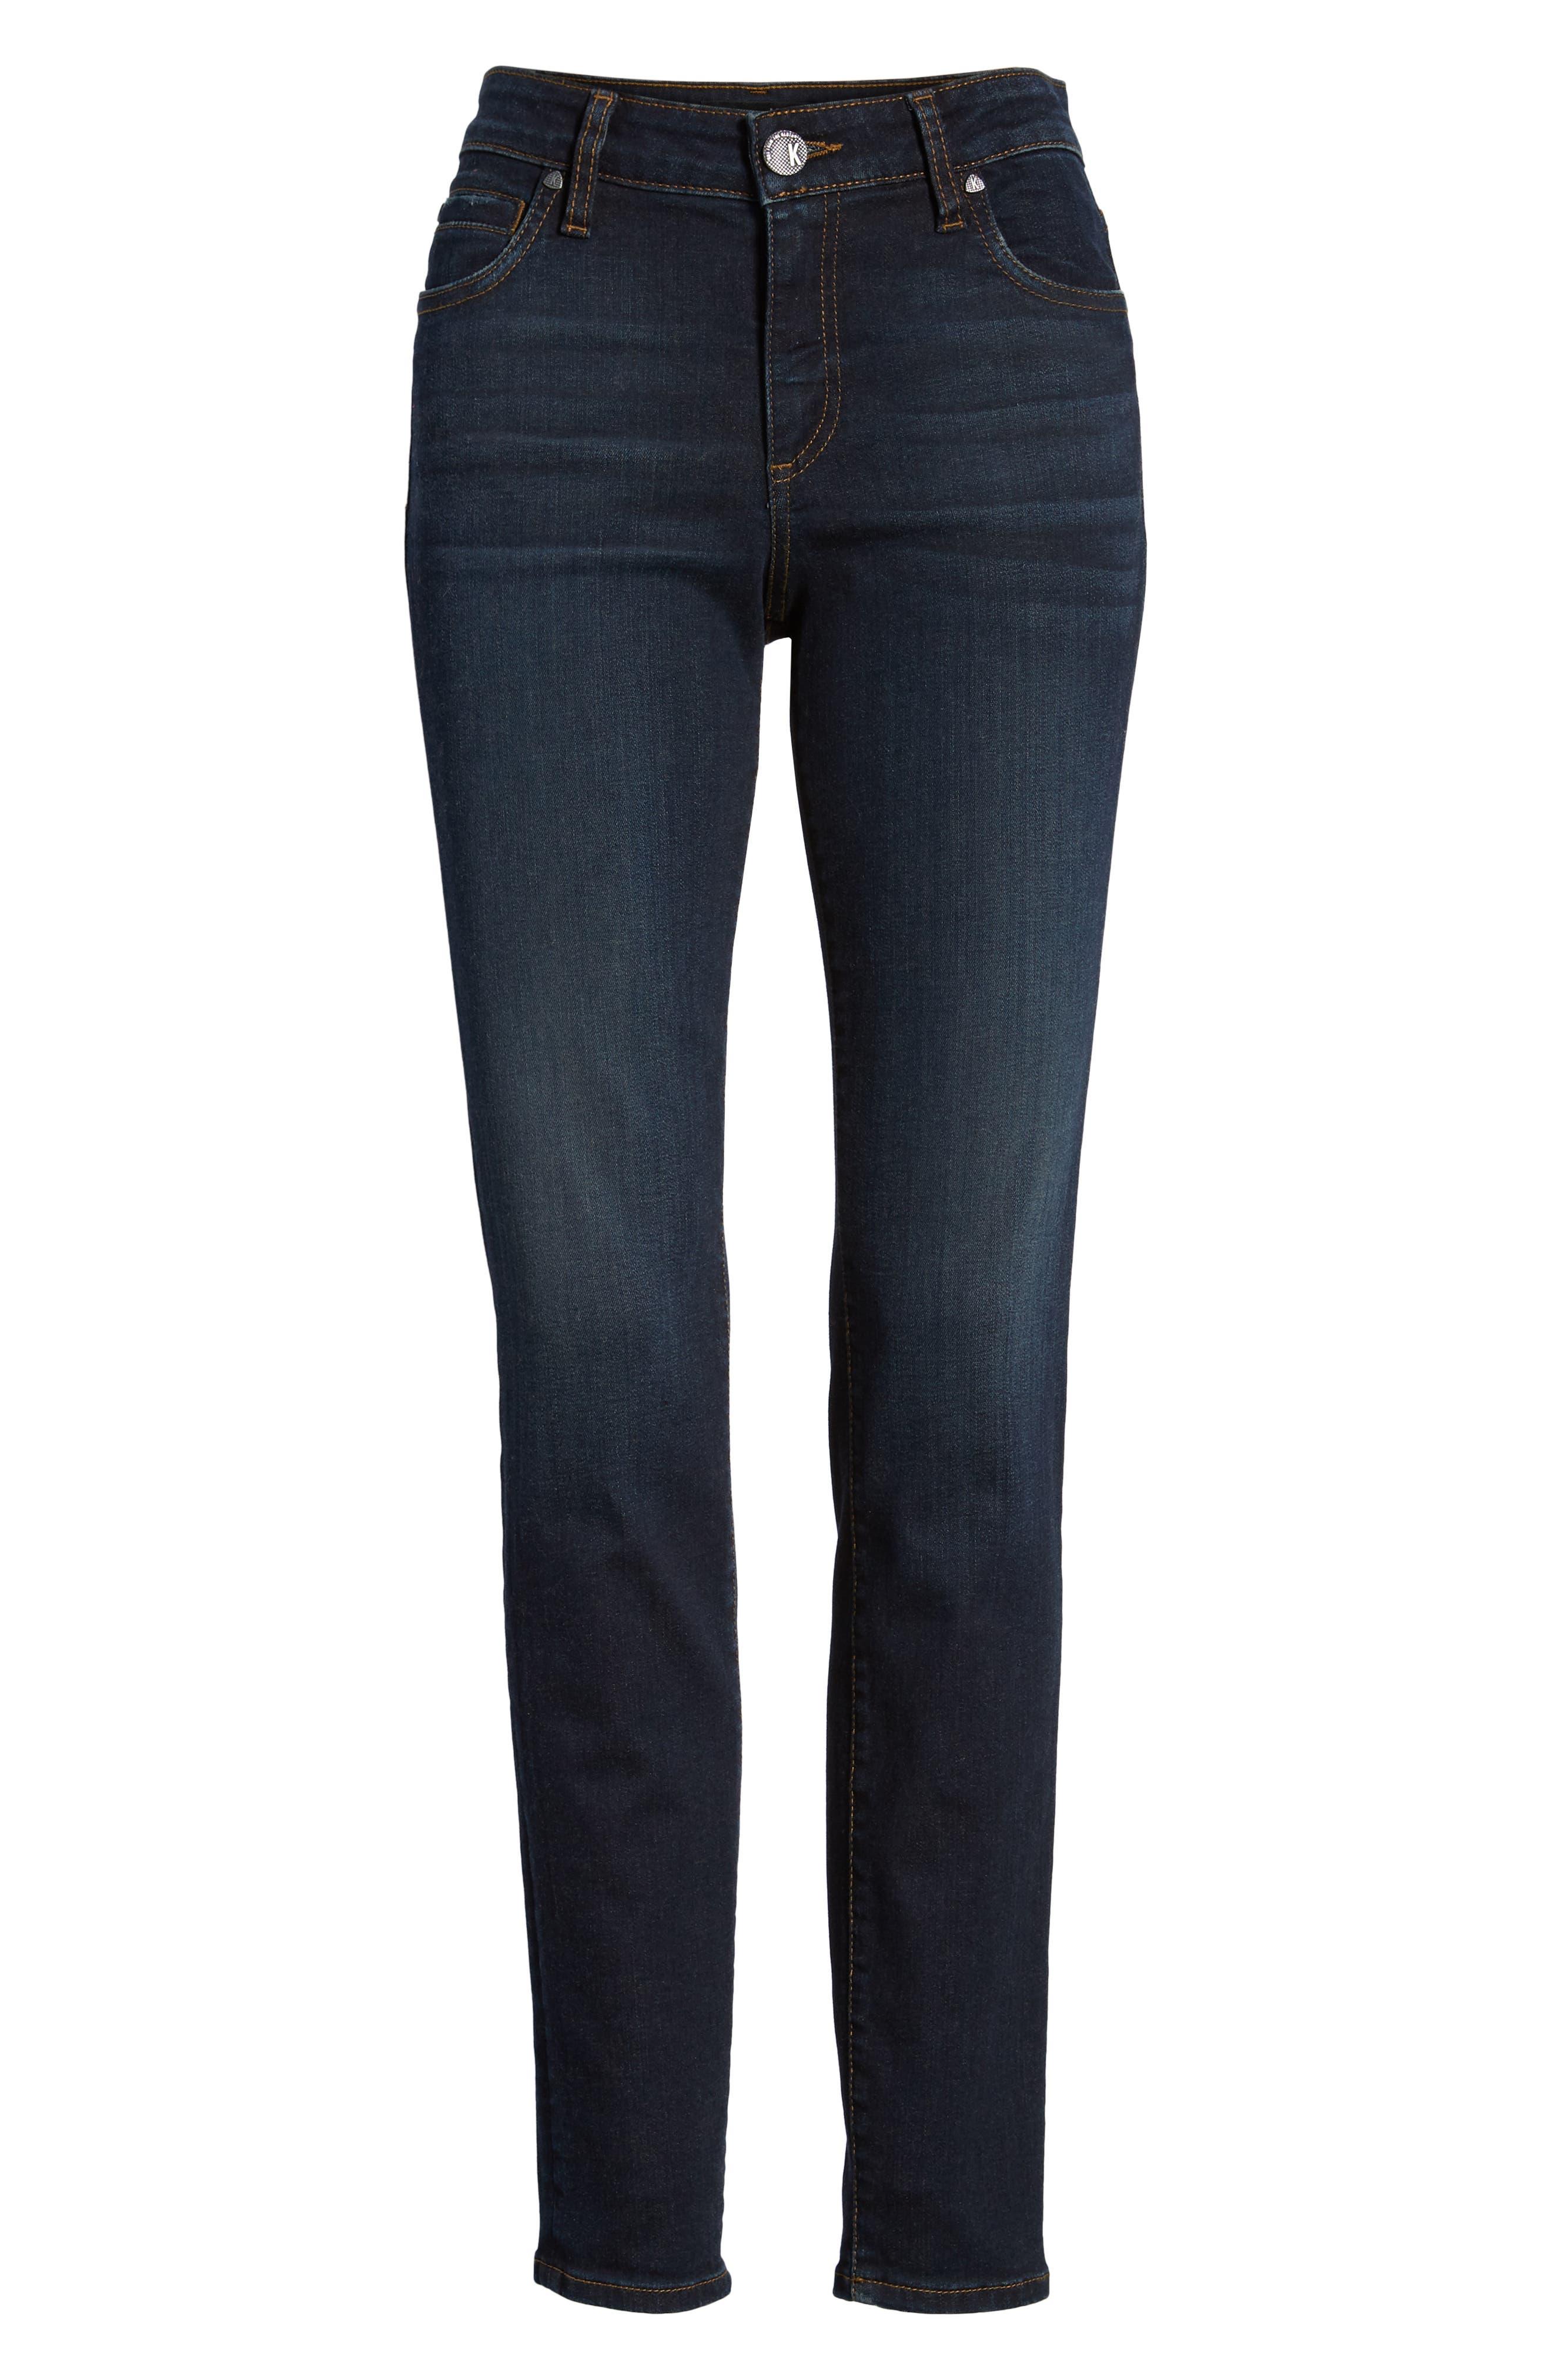 Diana Skinny Jeans,                             Alternate thumbnail 7, color,                             435